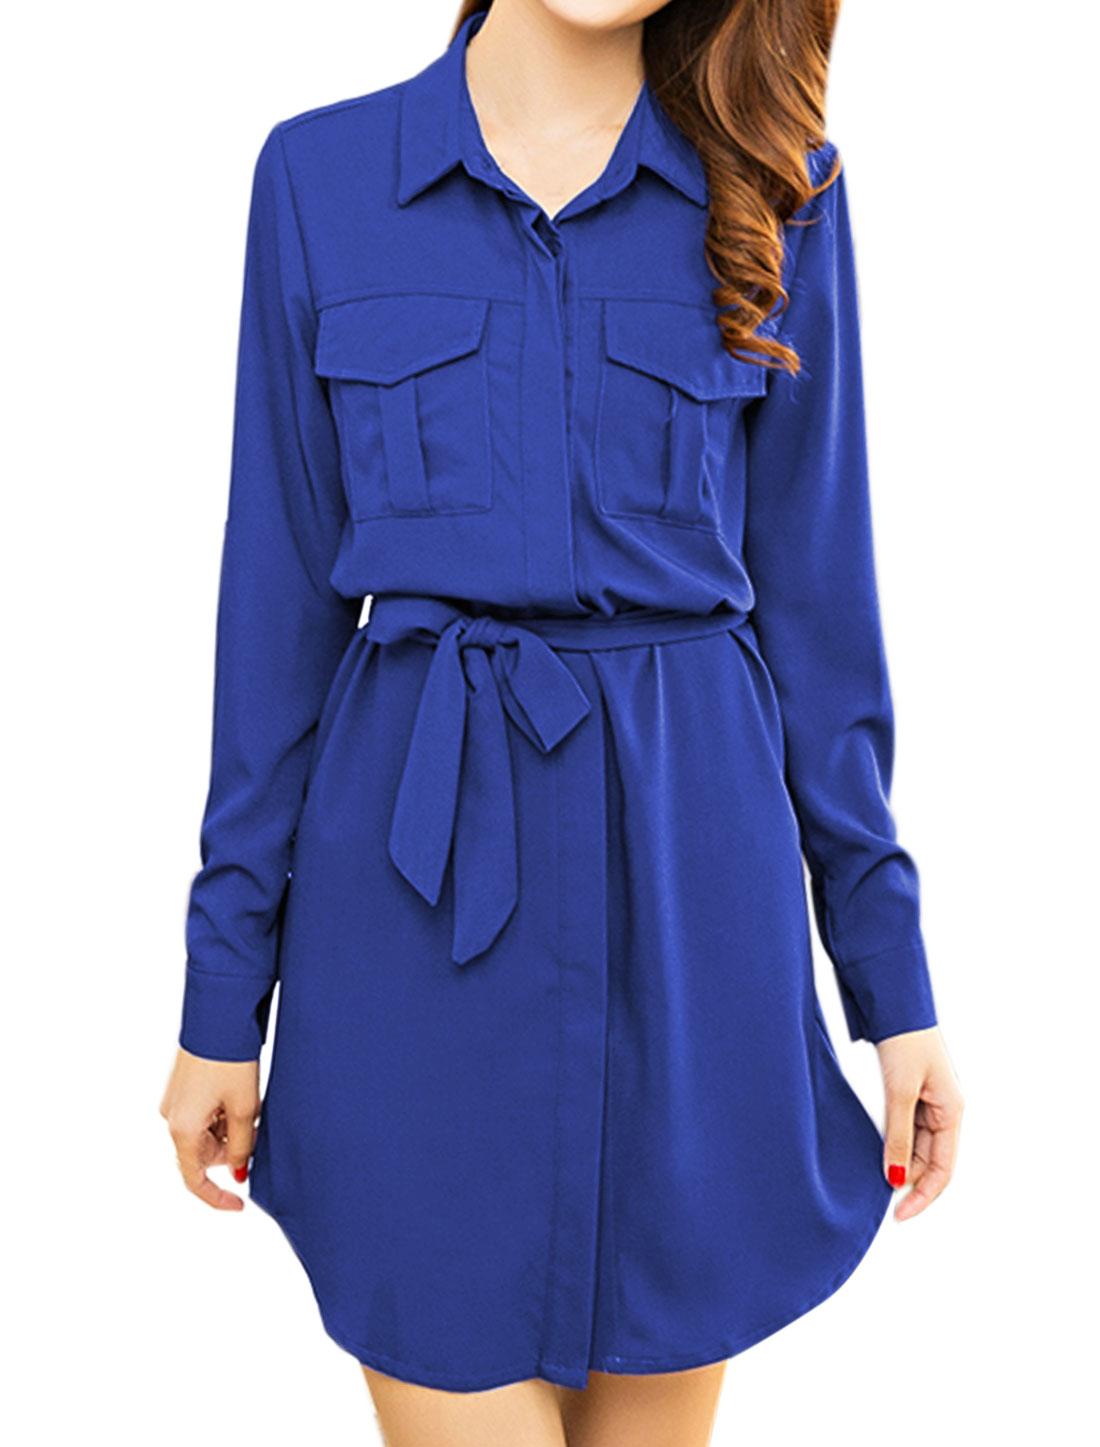 Woman Roll Up Sleeves Tunic Shirt Dress w Waist String Blue M